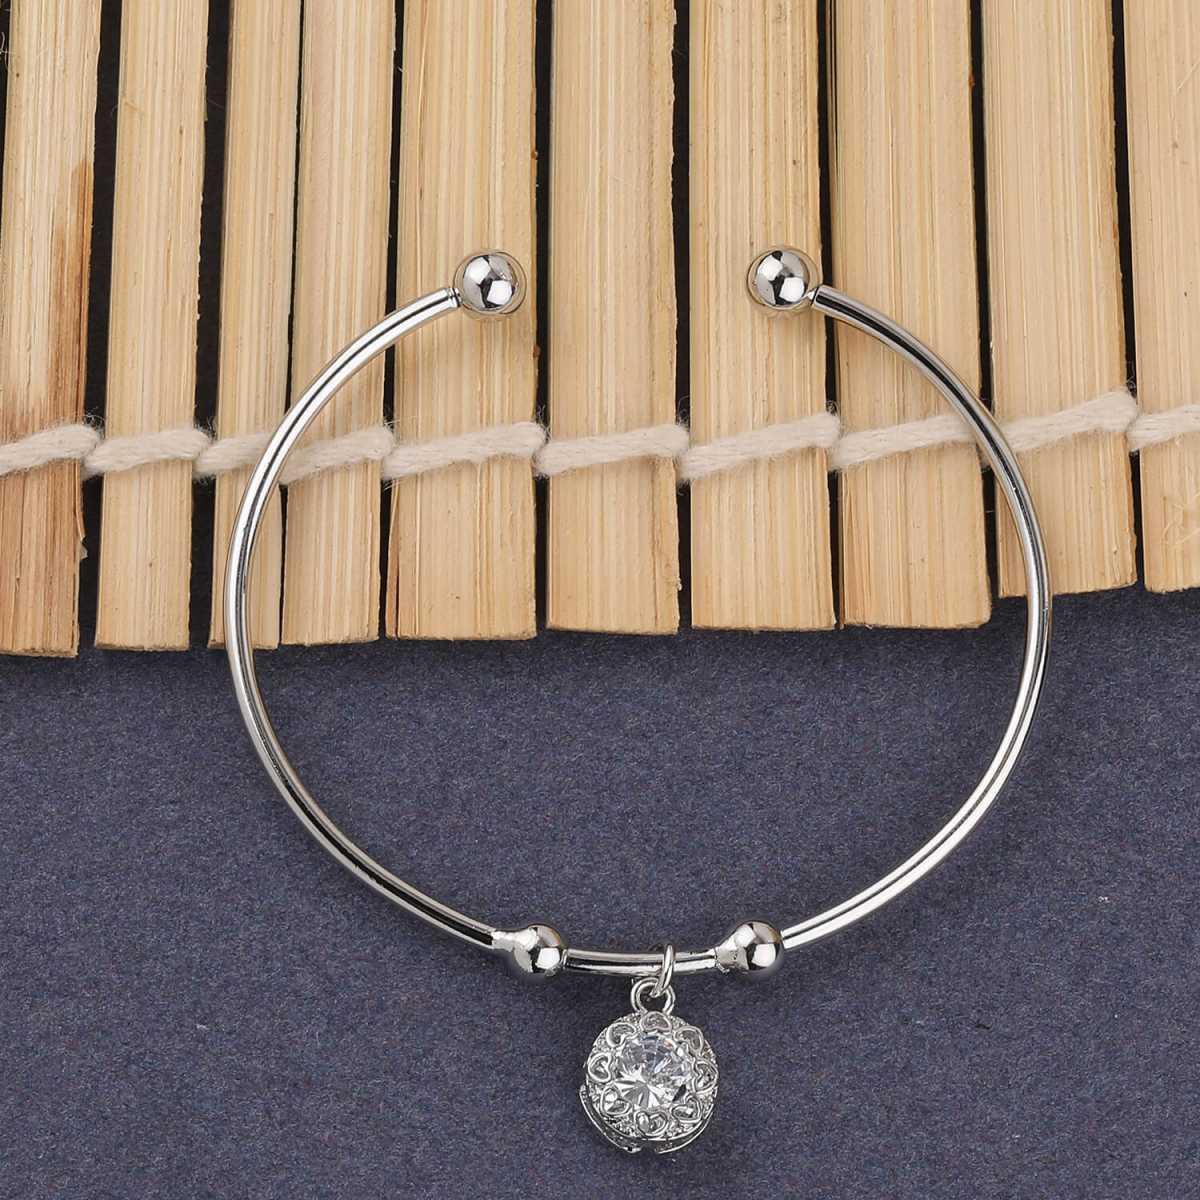 SILVER SHINE Party Wear Stylish Look Adjustable Bracelet With Diamond For Women Girls